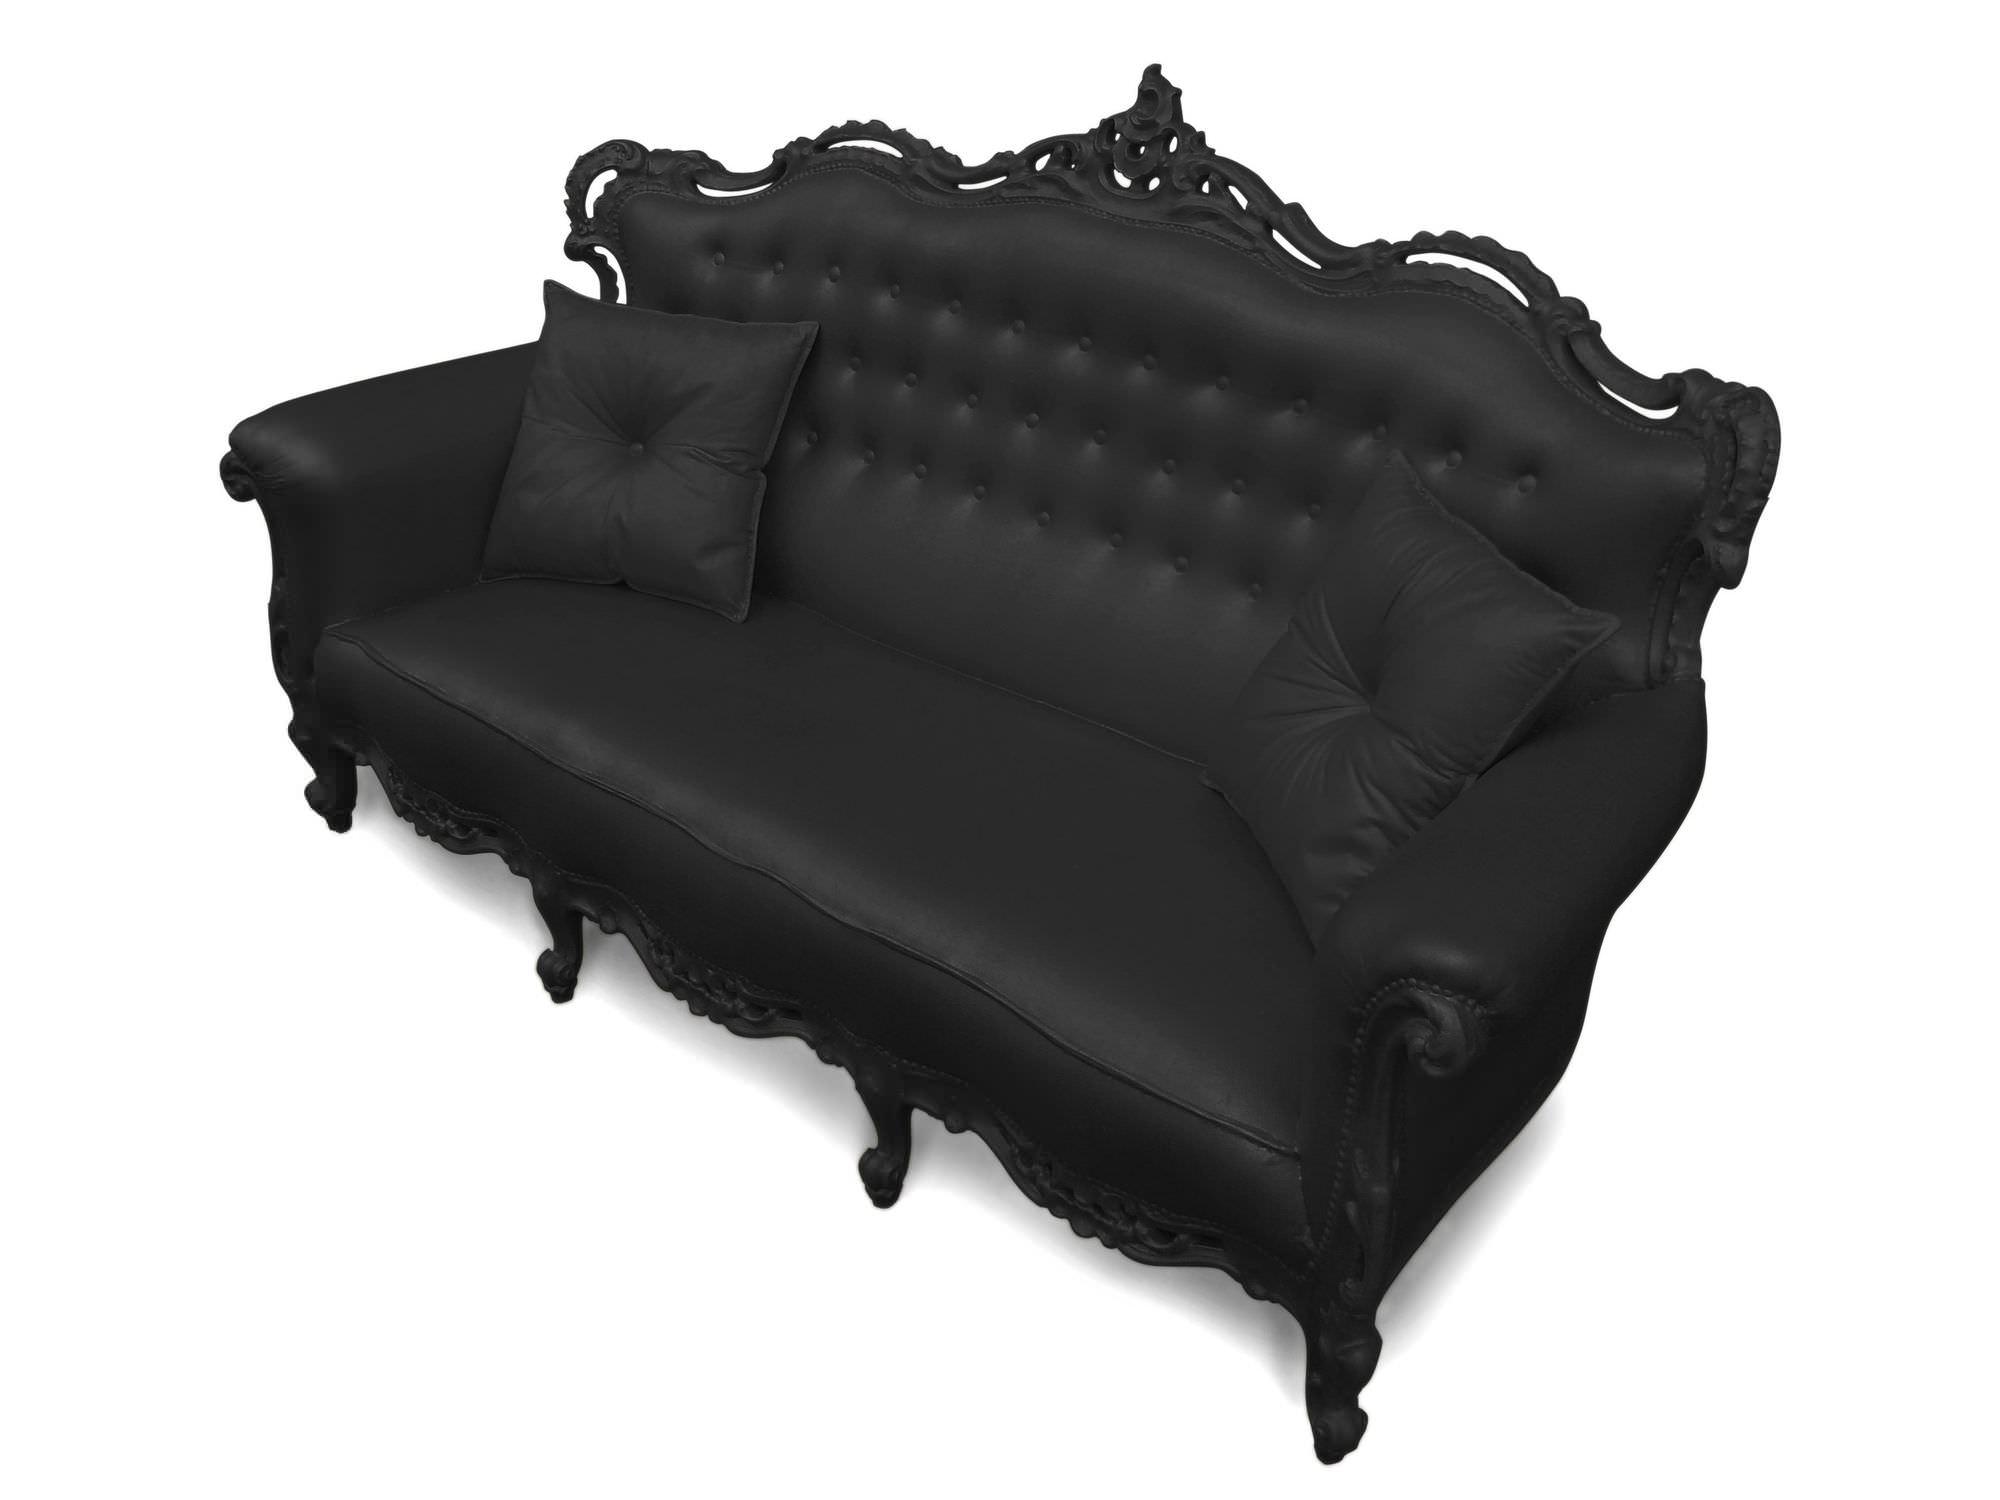 New Baroque design sofa / outdoor / polyurethane foam / 3-seater